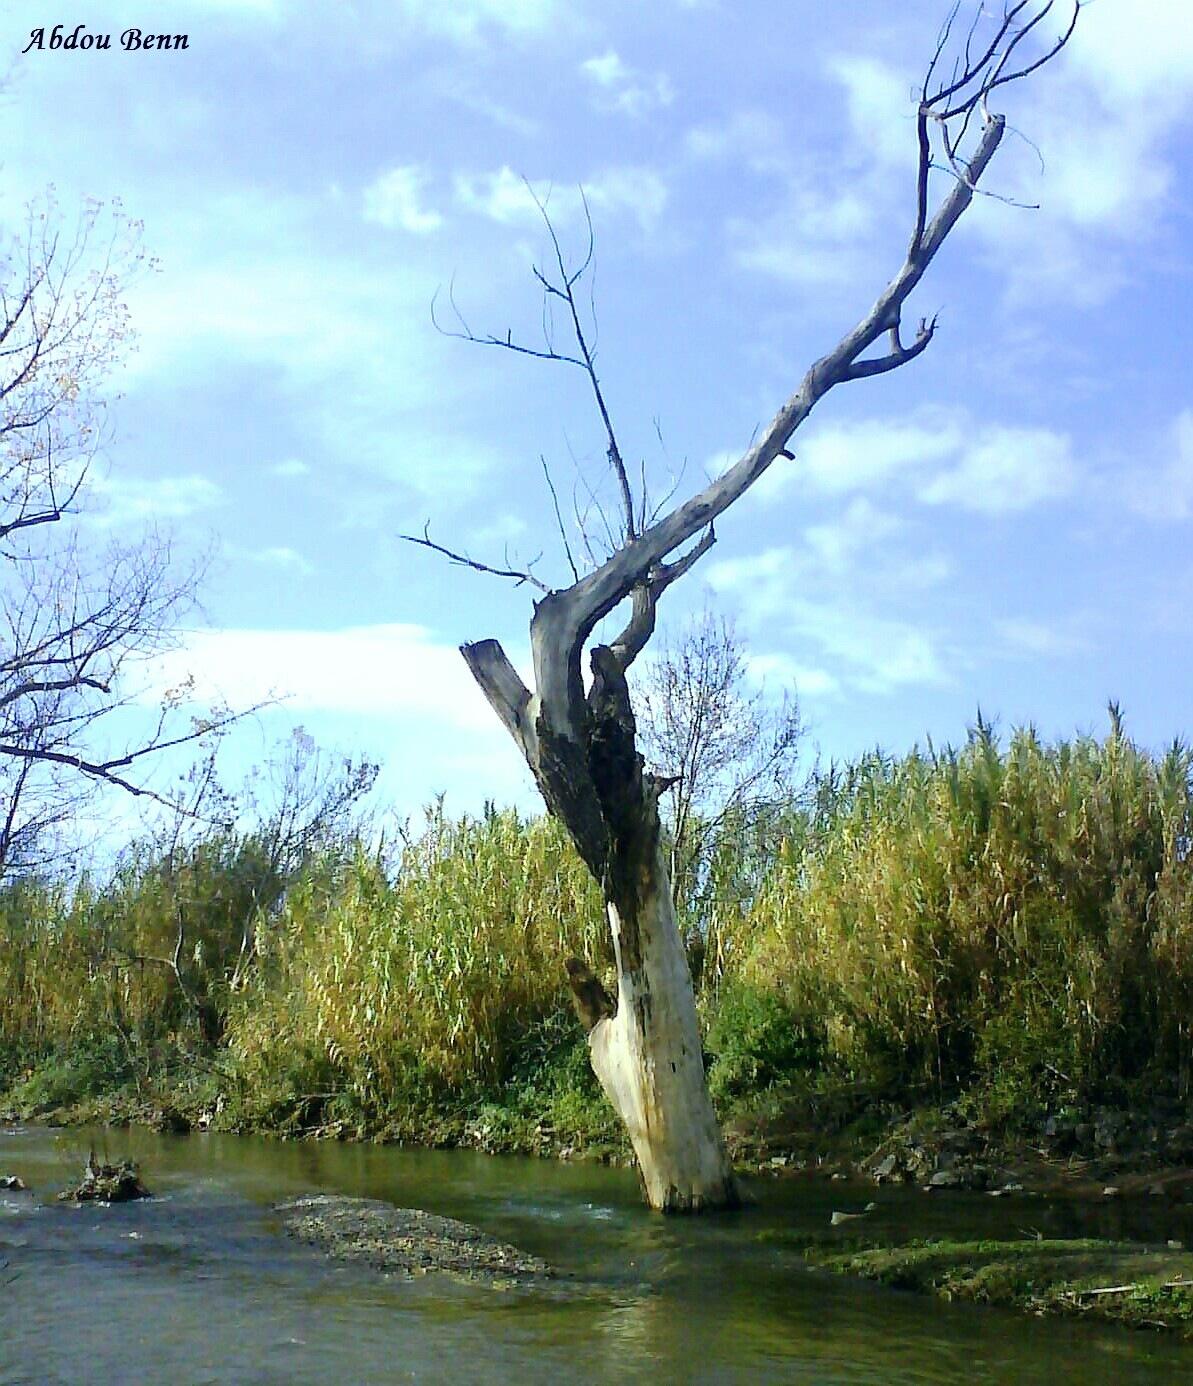 dead tree by Abdou_Benn